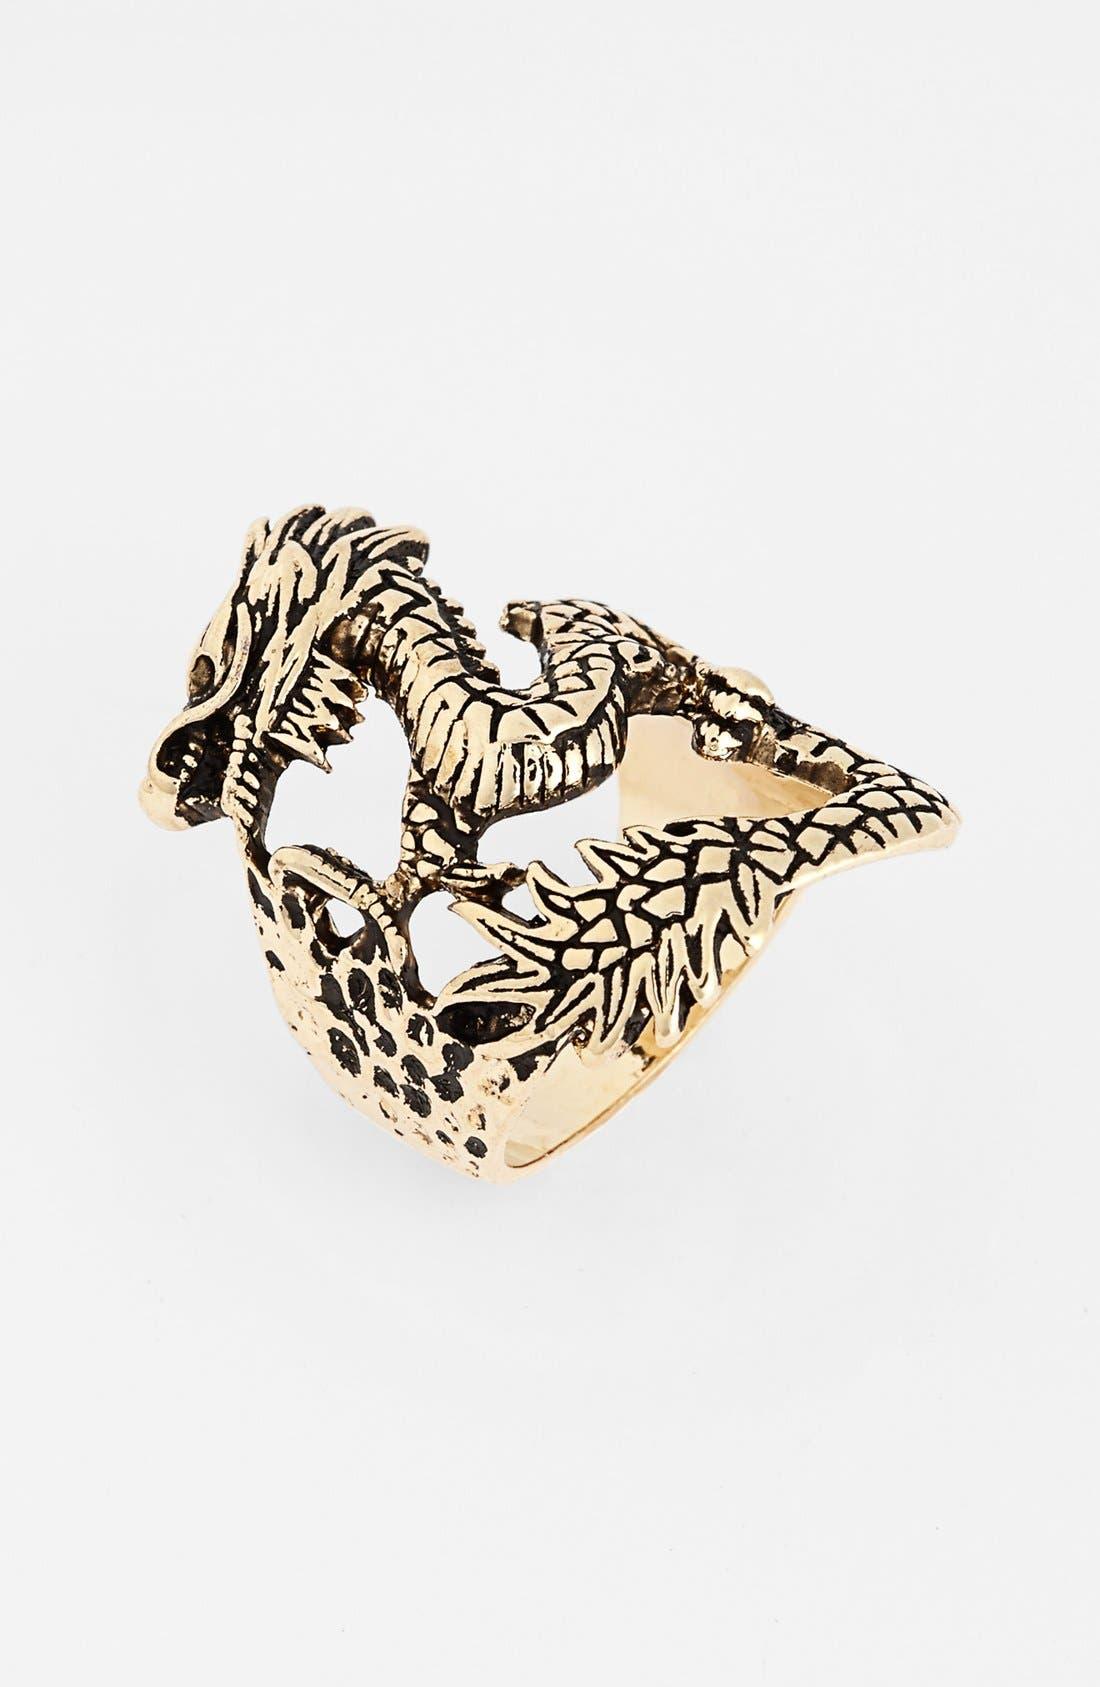 Alternate Image 1 Selected - Natasha Couture 'Dragon' Statement Ring